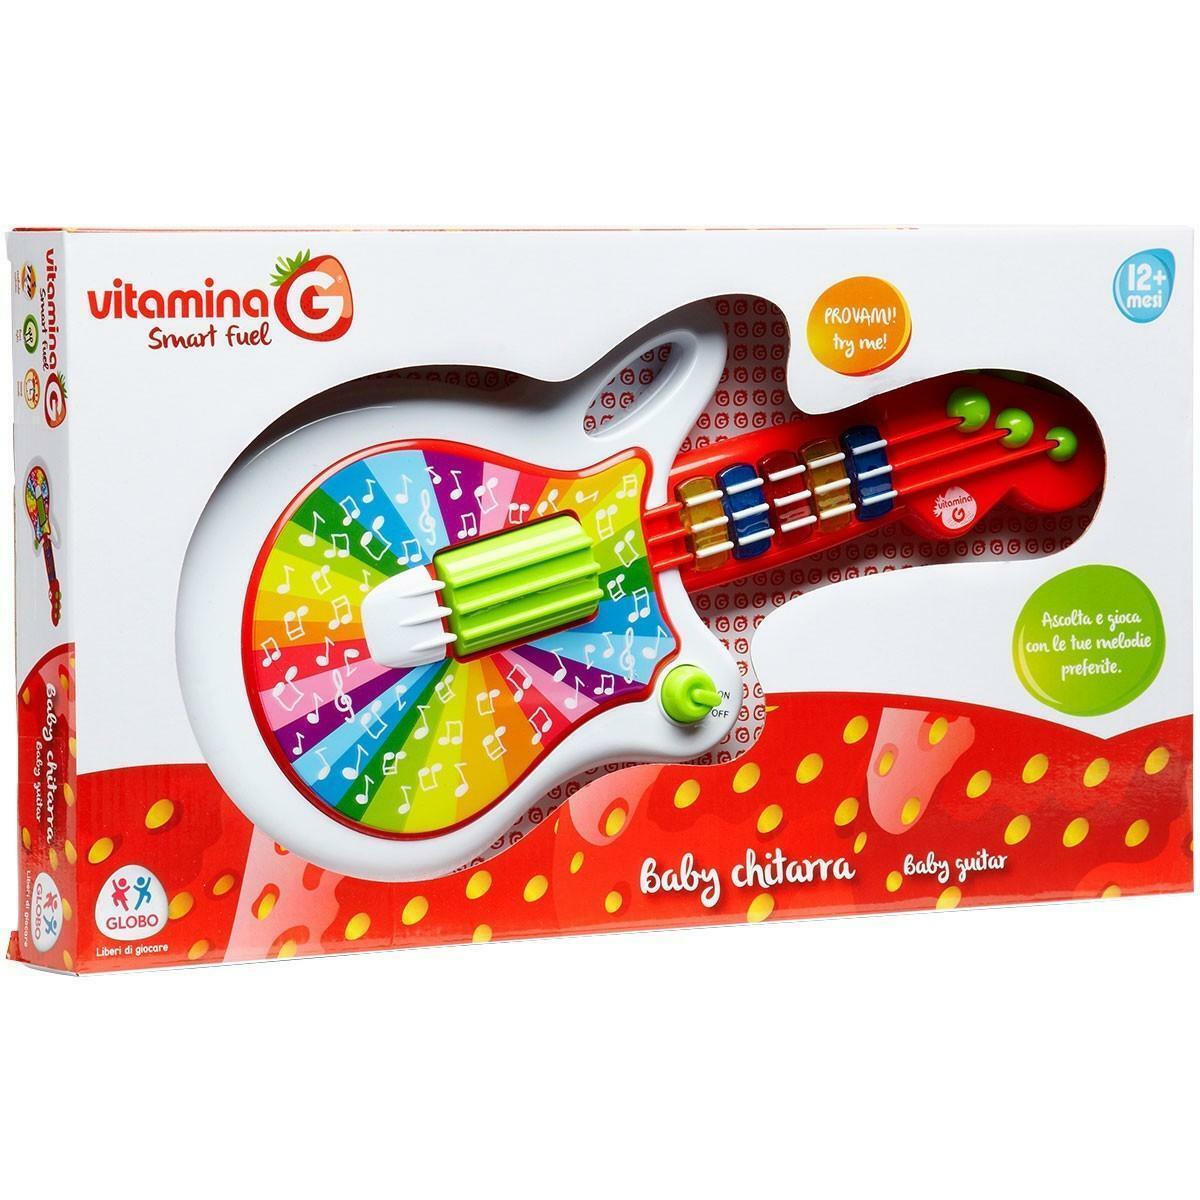 globo globo vitamina g - baby chitarra luci e suoni